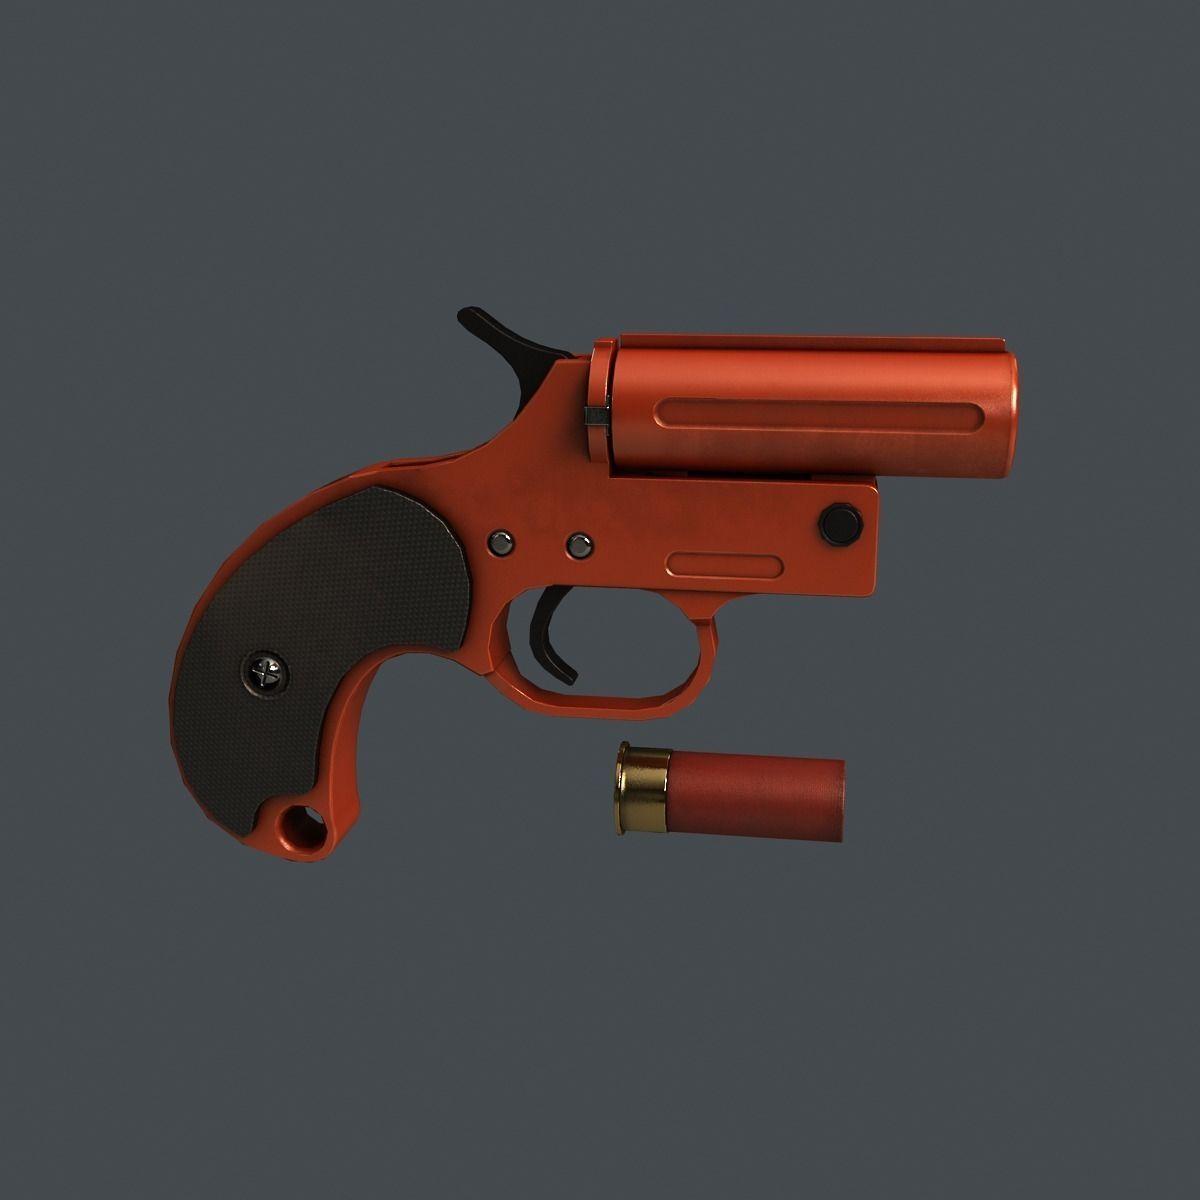 3d Gun Image 3d Home Architect: 3D Model Flare Gun VR / AR / Low-poly MAX OBJ FBX TGA